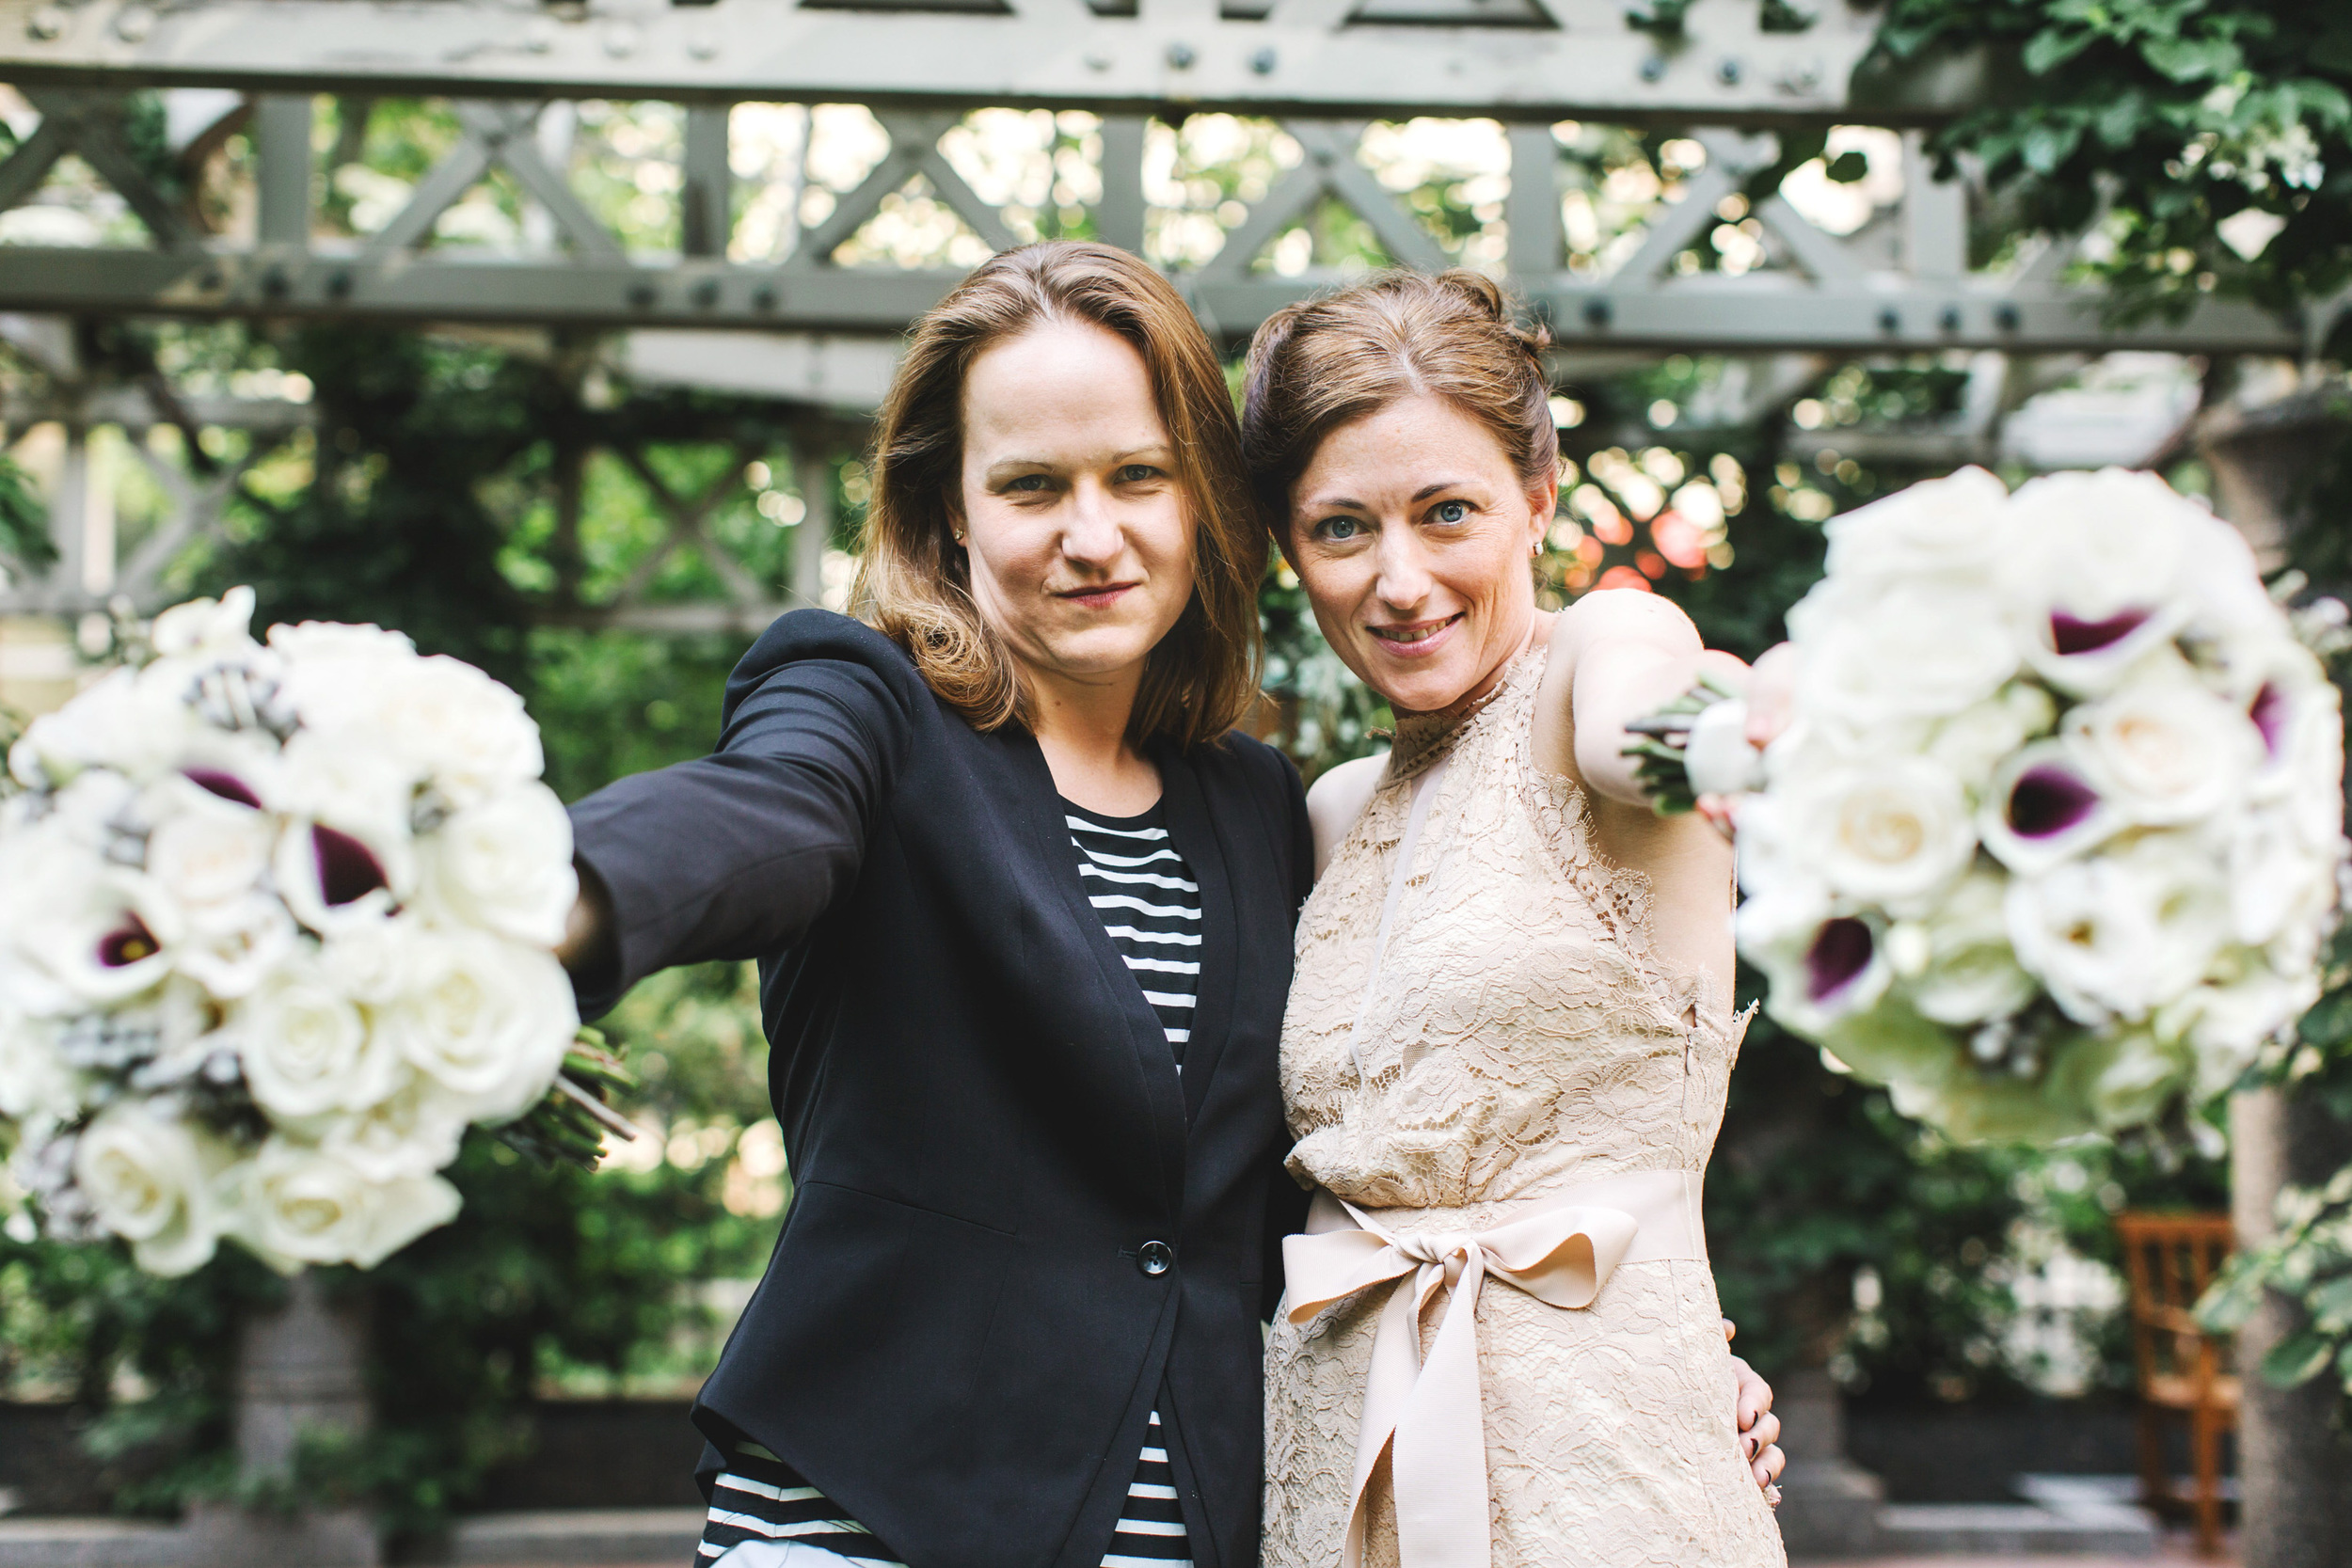 Boston_Wedding_Photographer_Lena_Mirisola-22.jpg